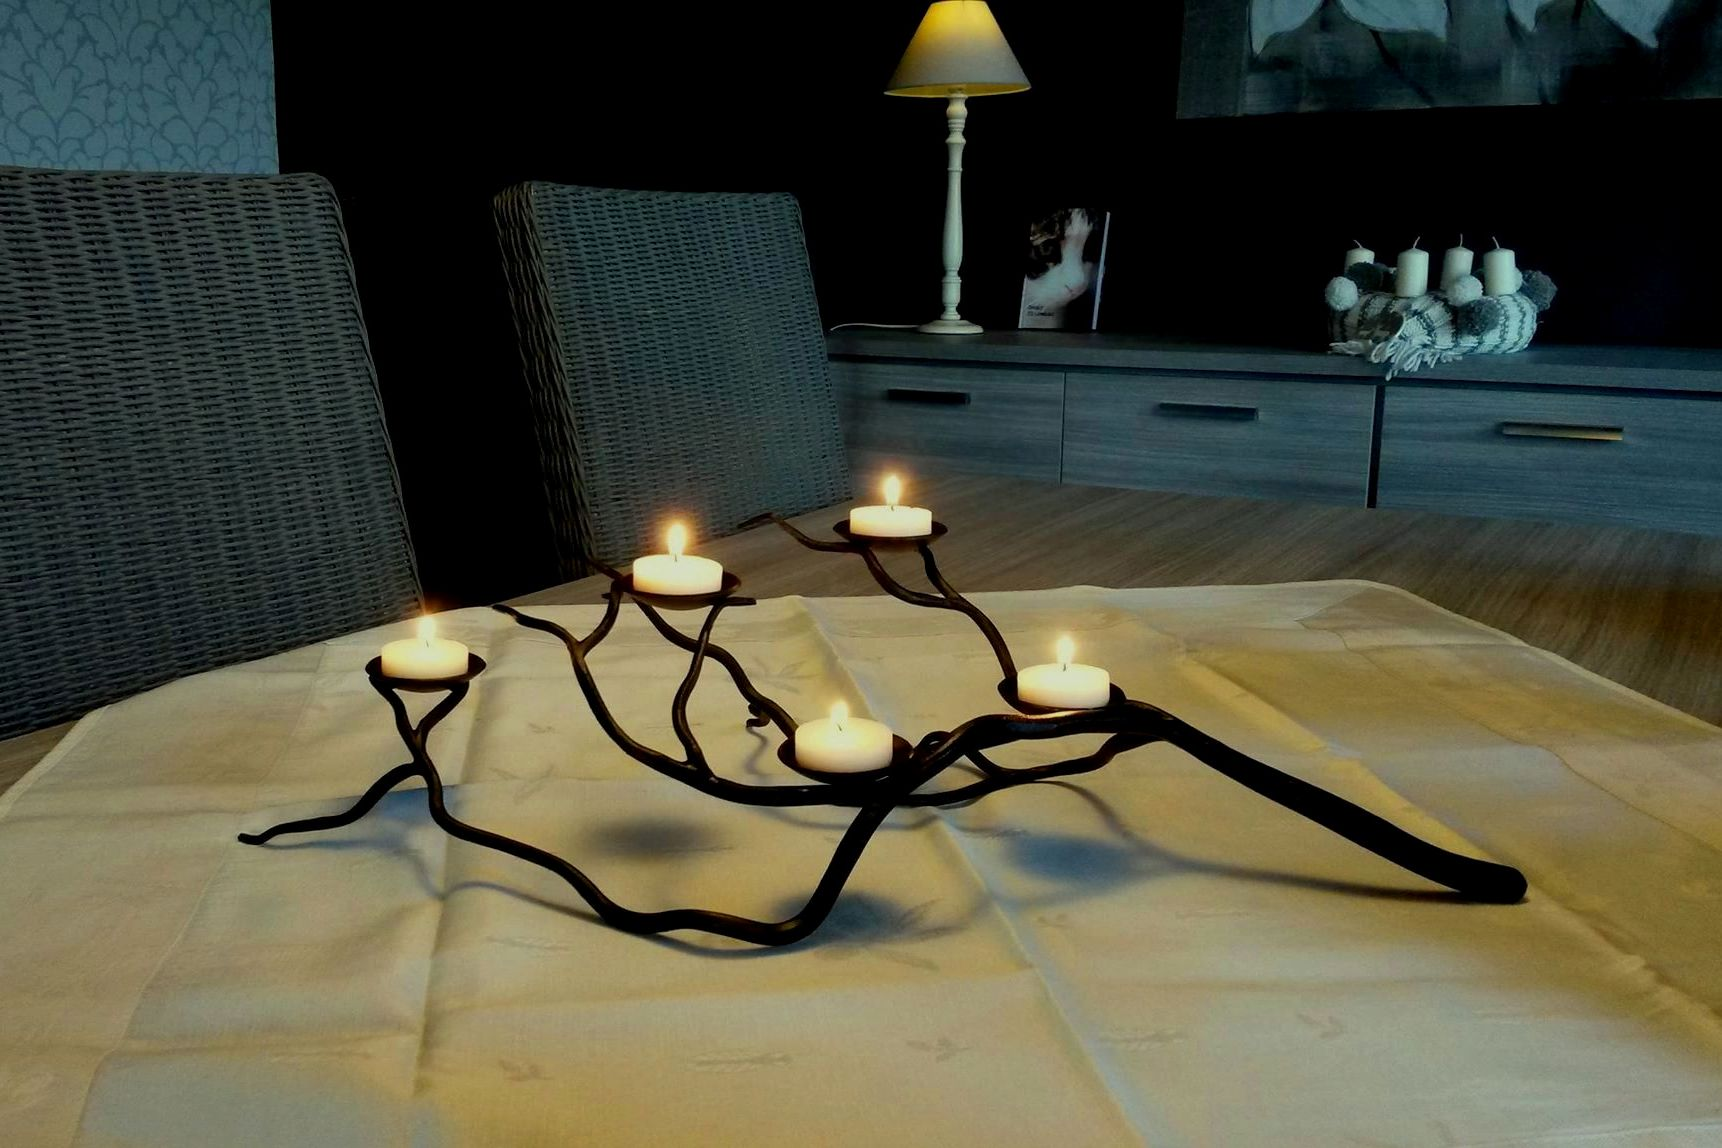 Smeedijzer, tak, decoratie, sfeerverlichting, design